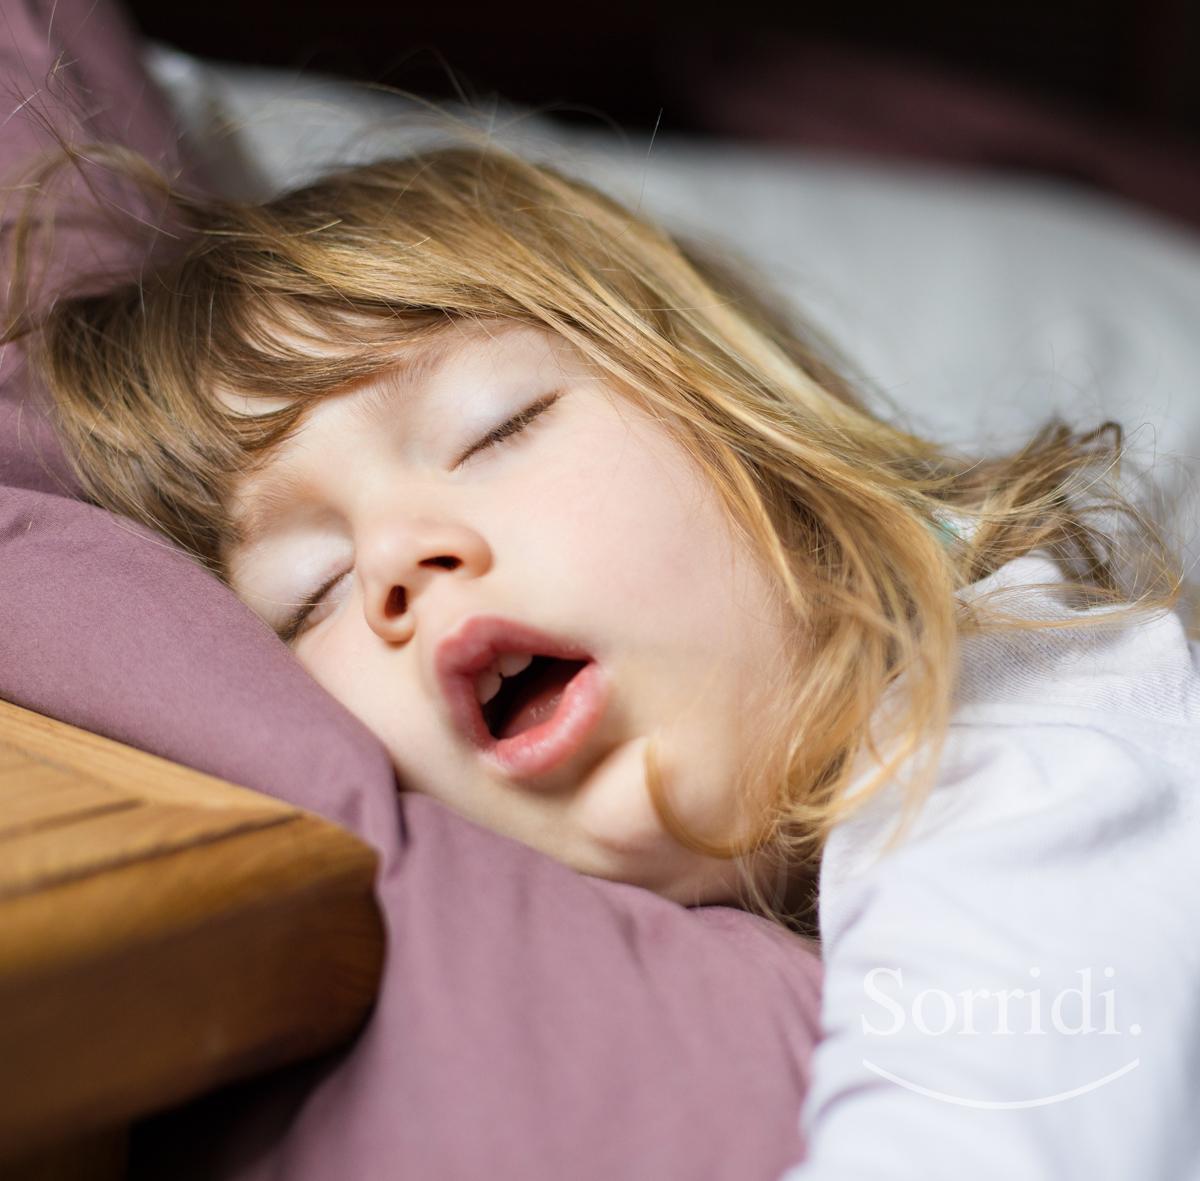 Apnee-notturne-bambini-adulti-Sorridi-magazine-il-dentista-risponde